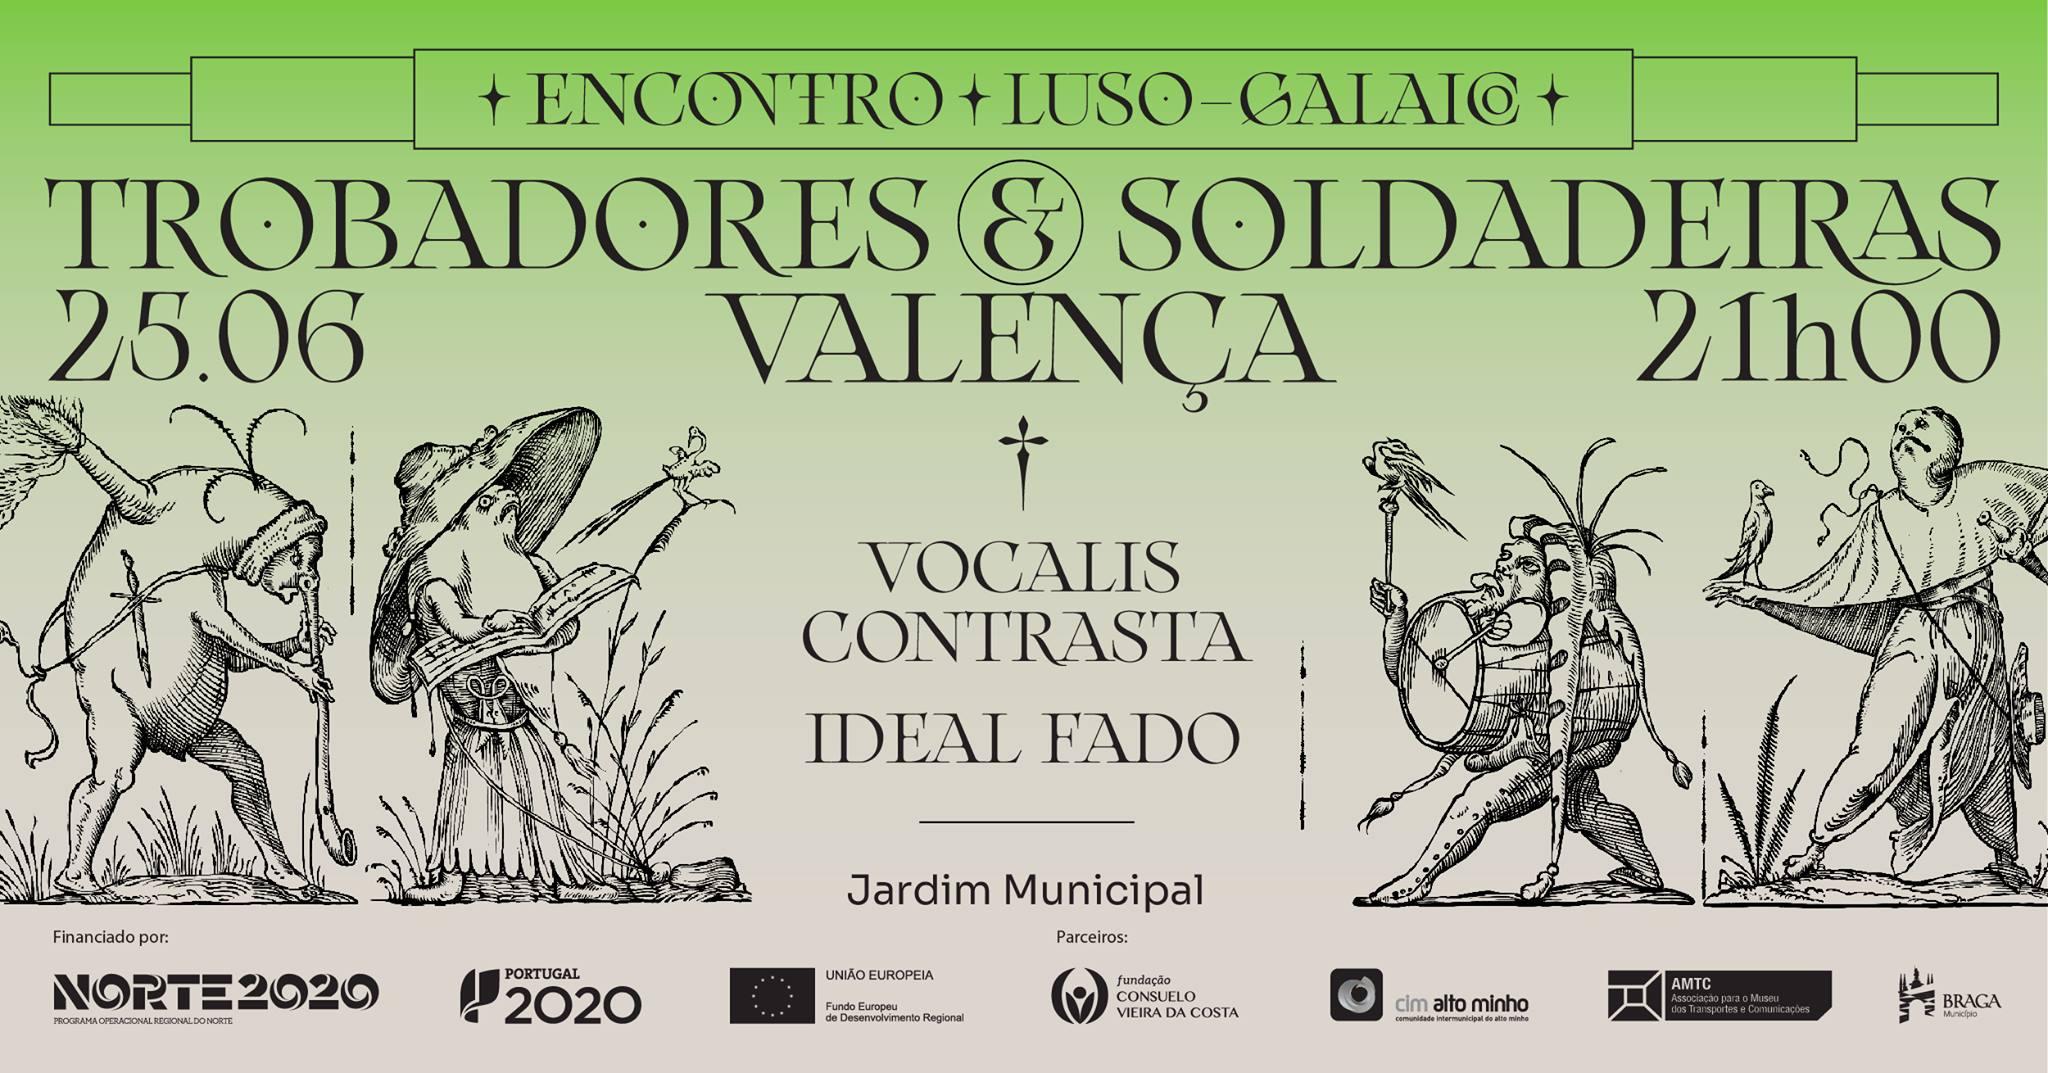 Concerto Trobadores & Soldadeiras